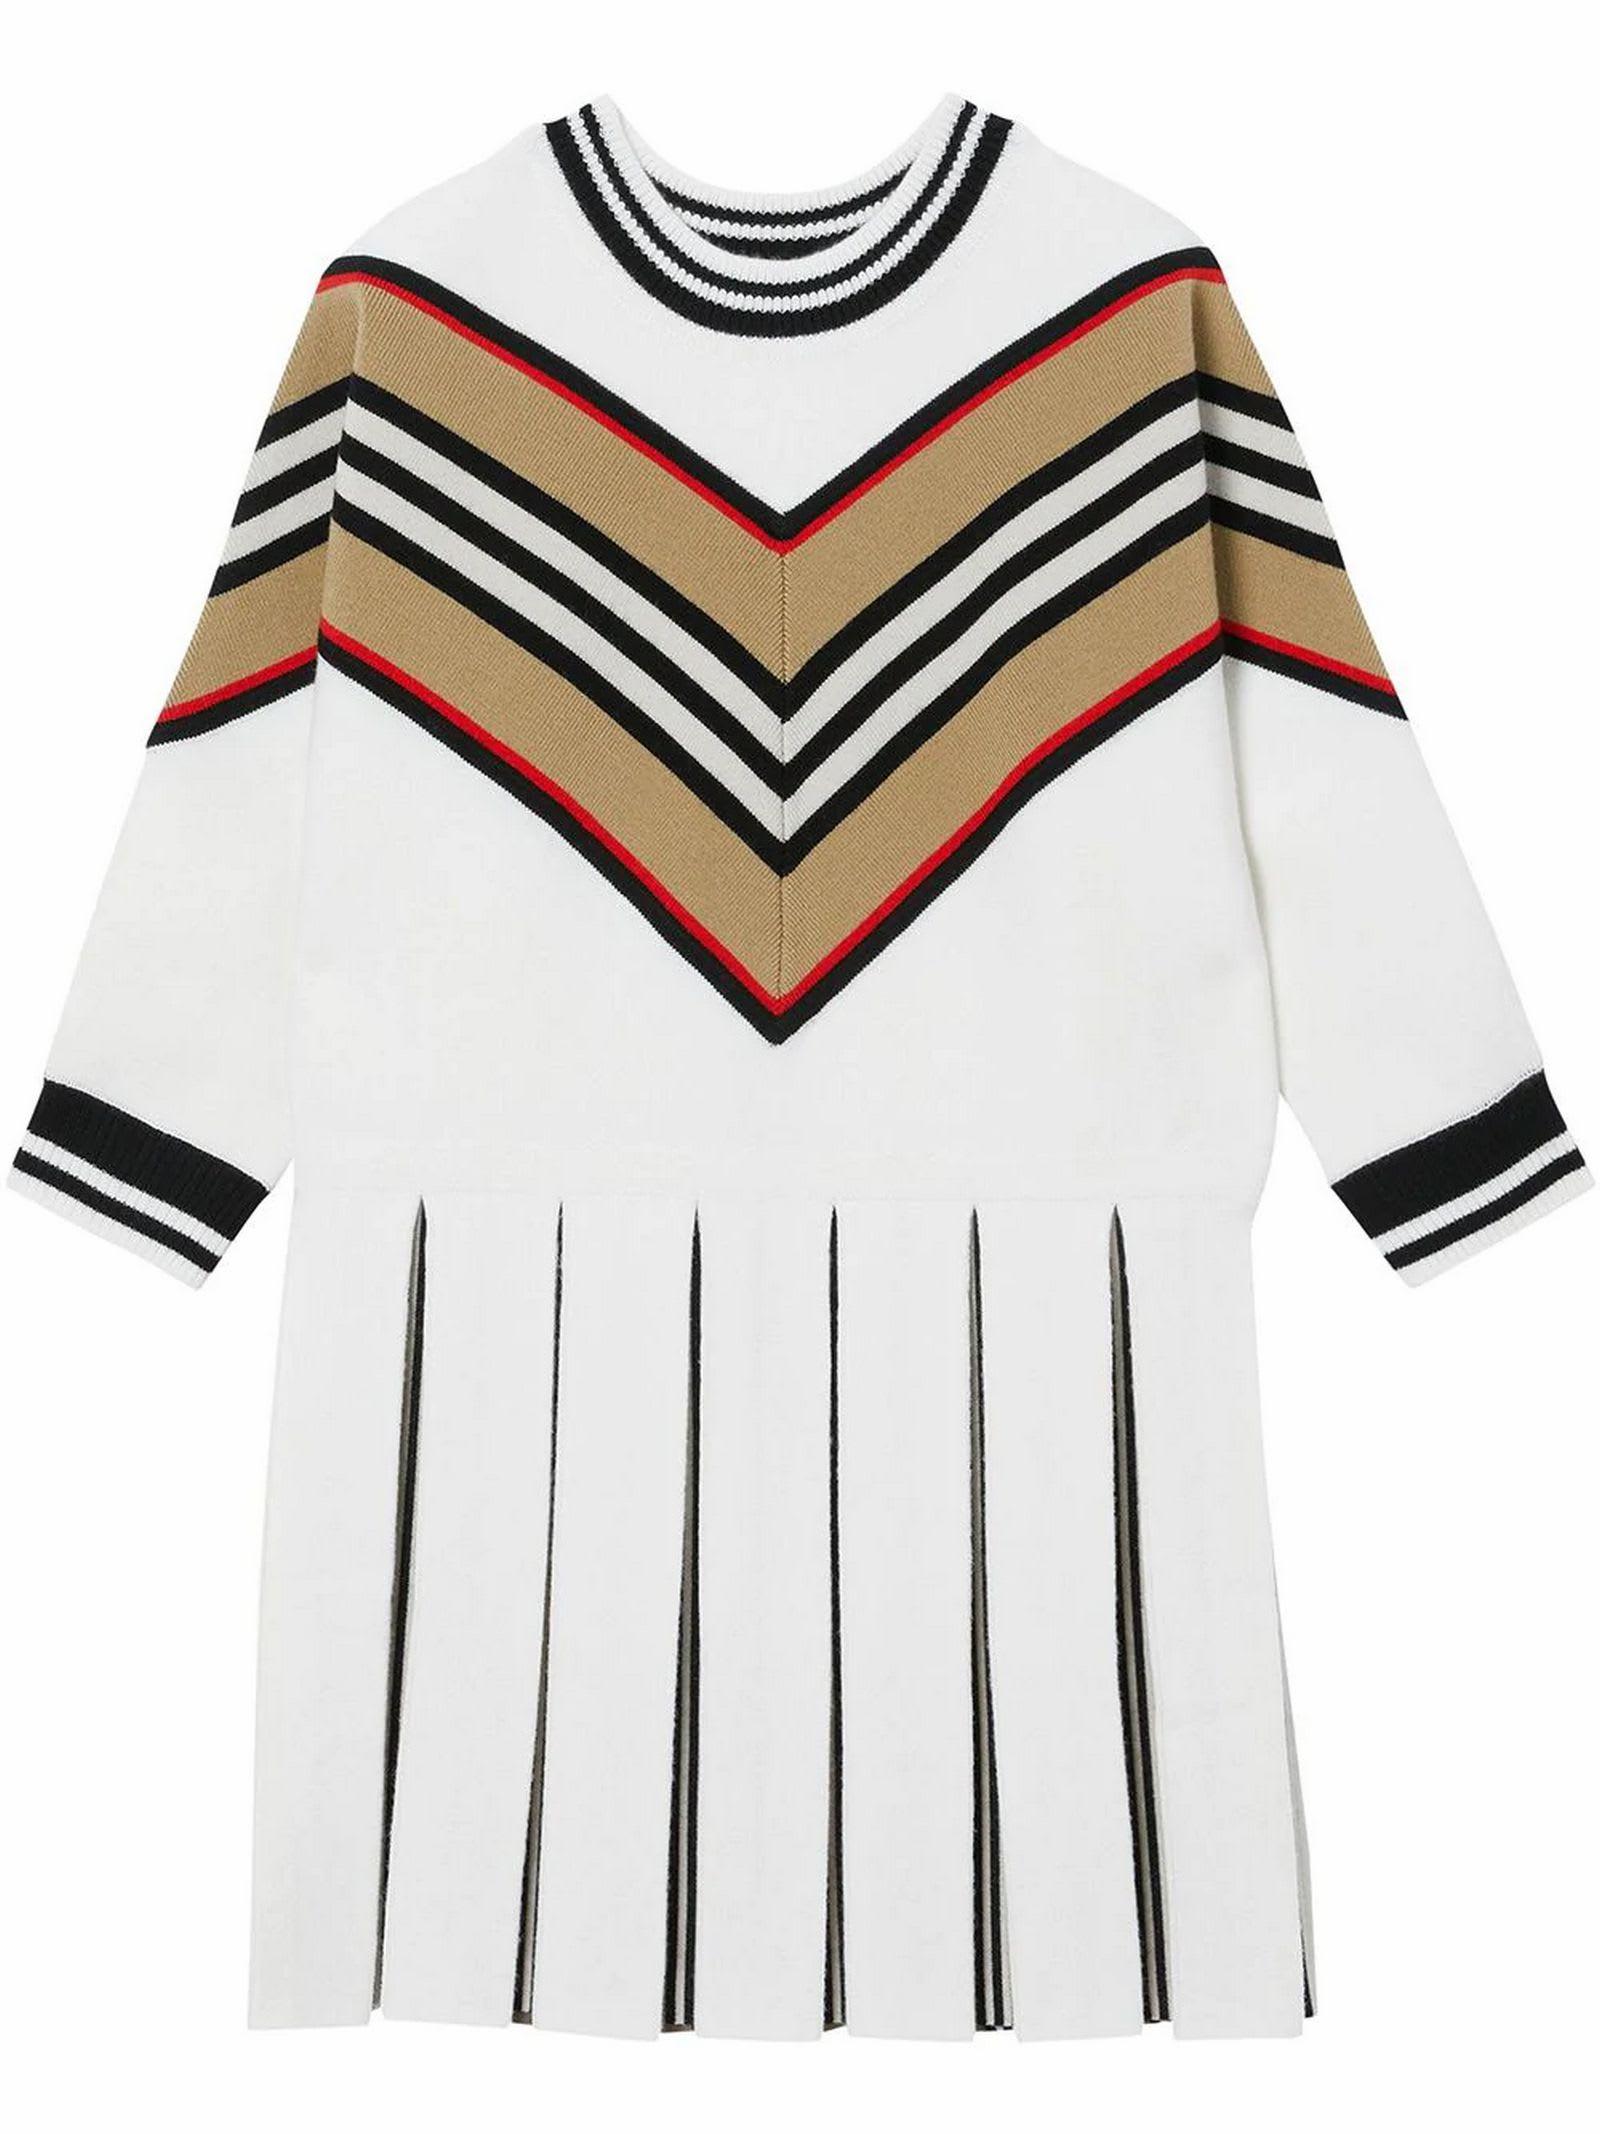 Burberry White Wool Dress